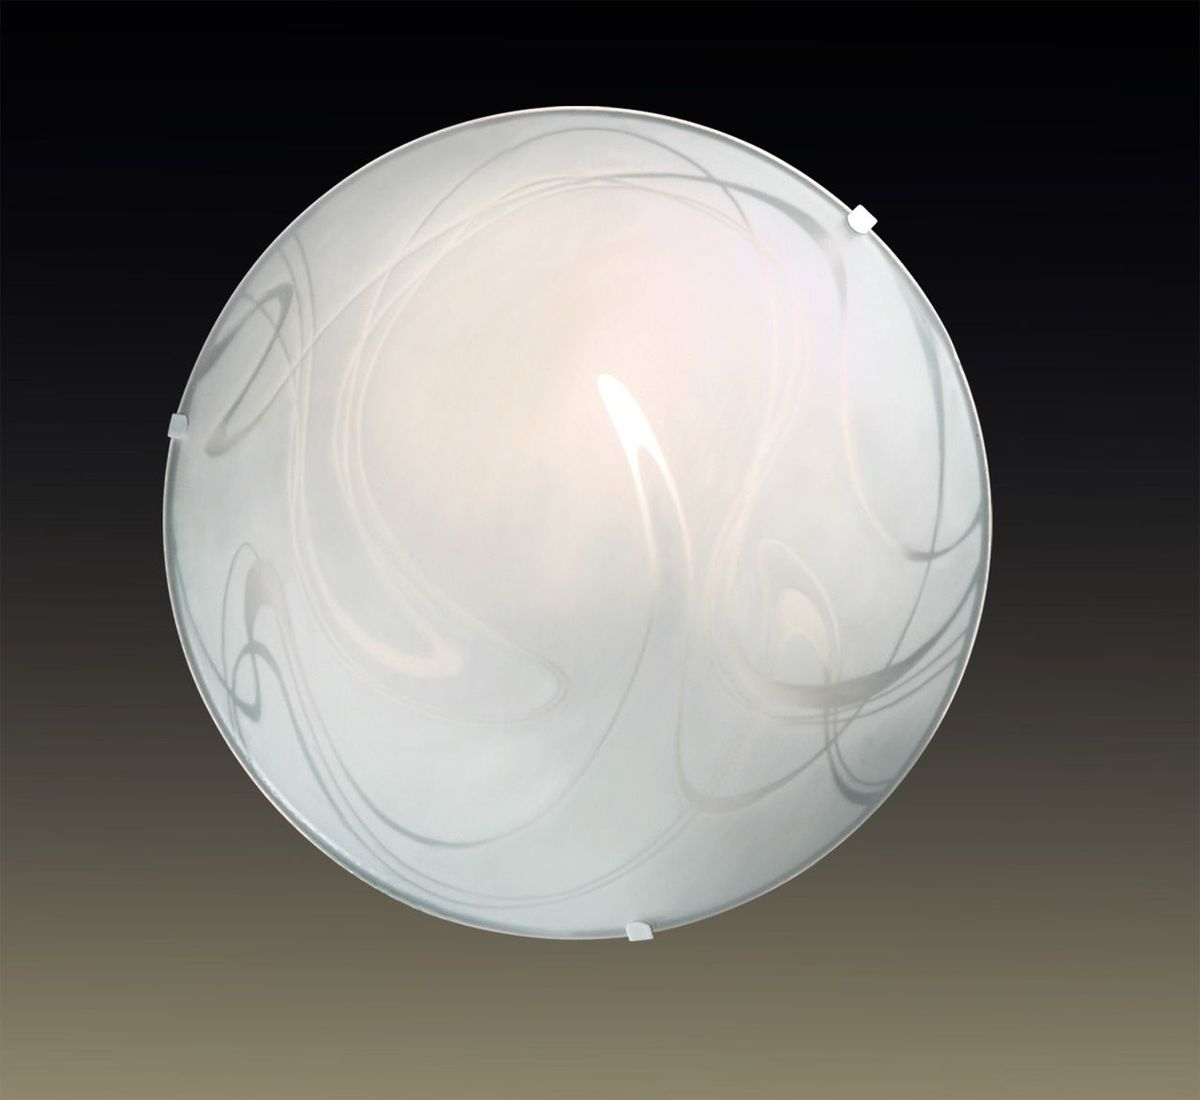 Cветильник настенный Sonex Tubio, 1 х E27, 60W. 1223/S1223/S